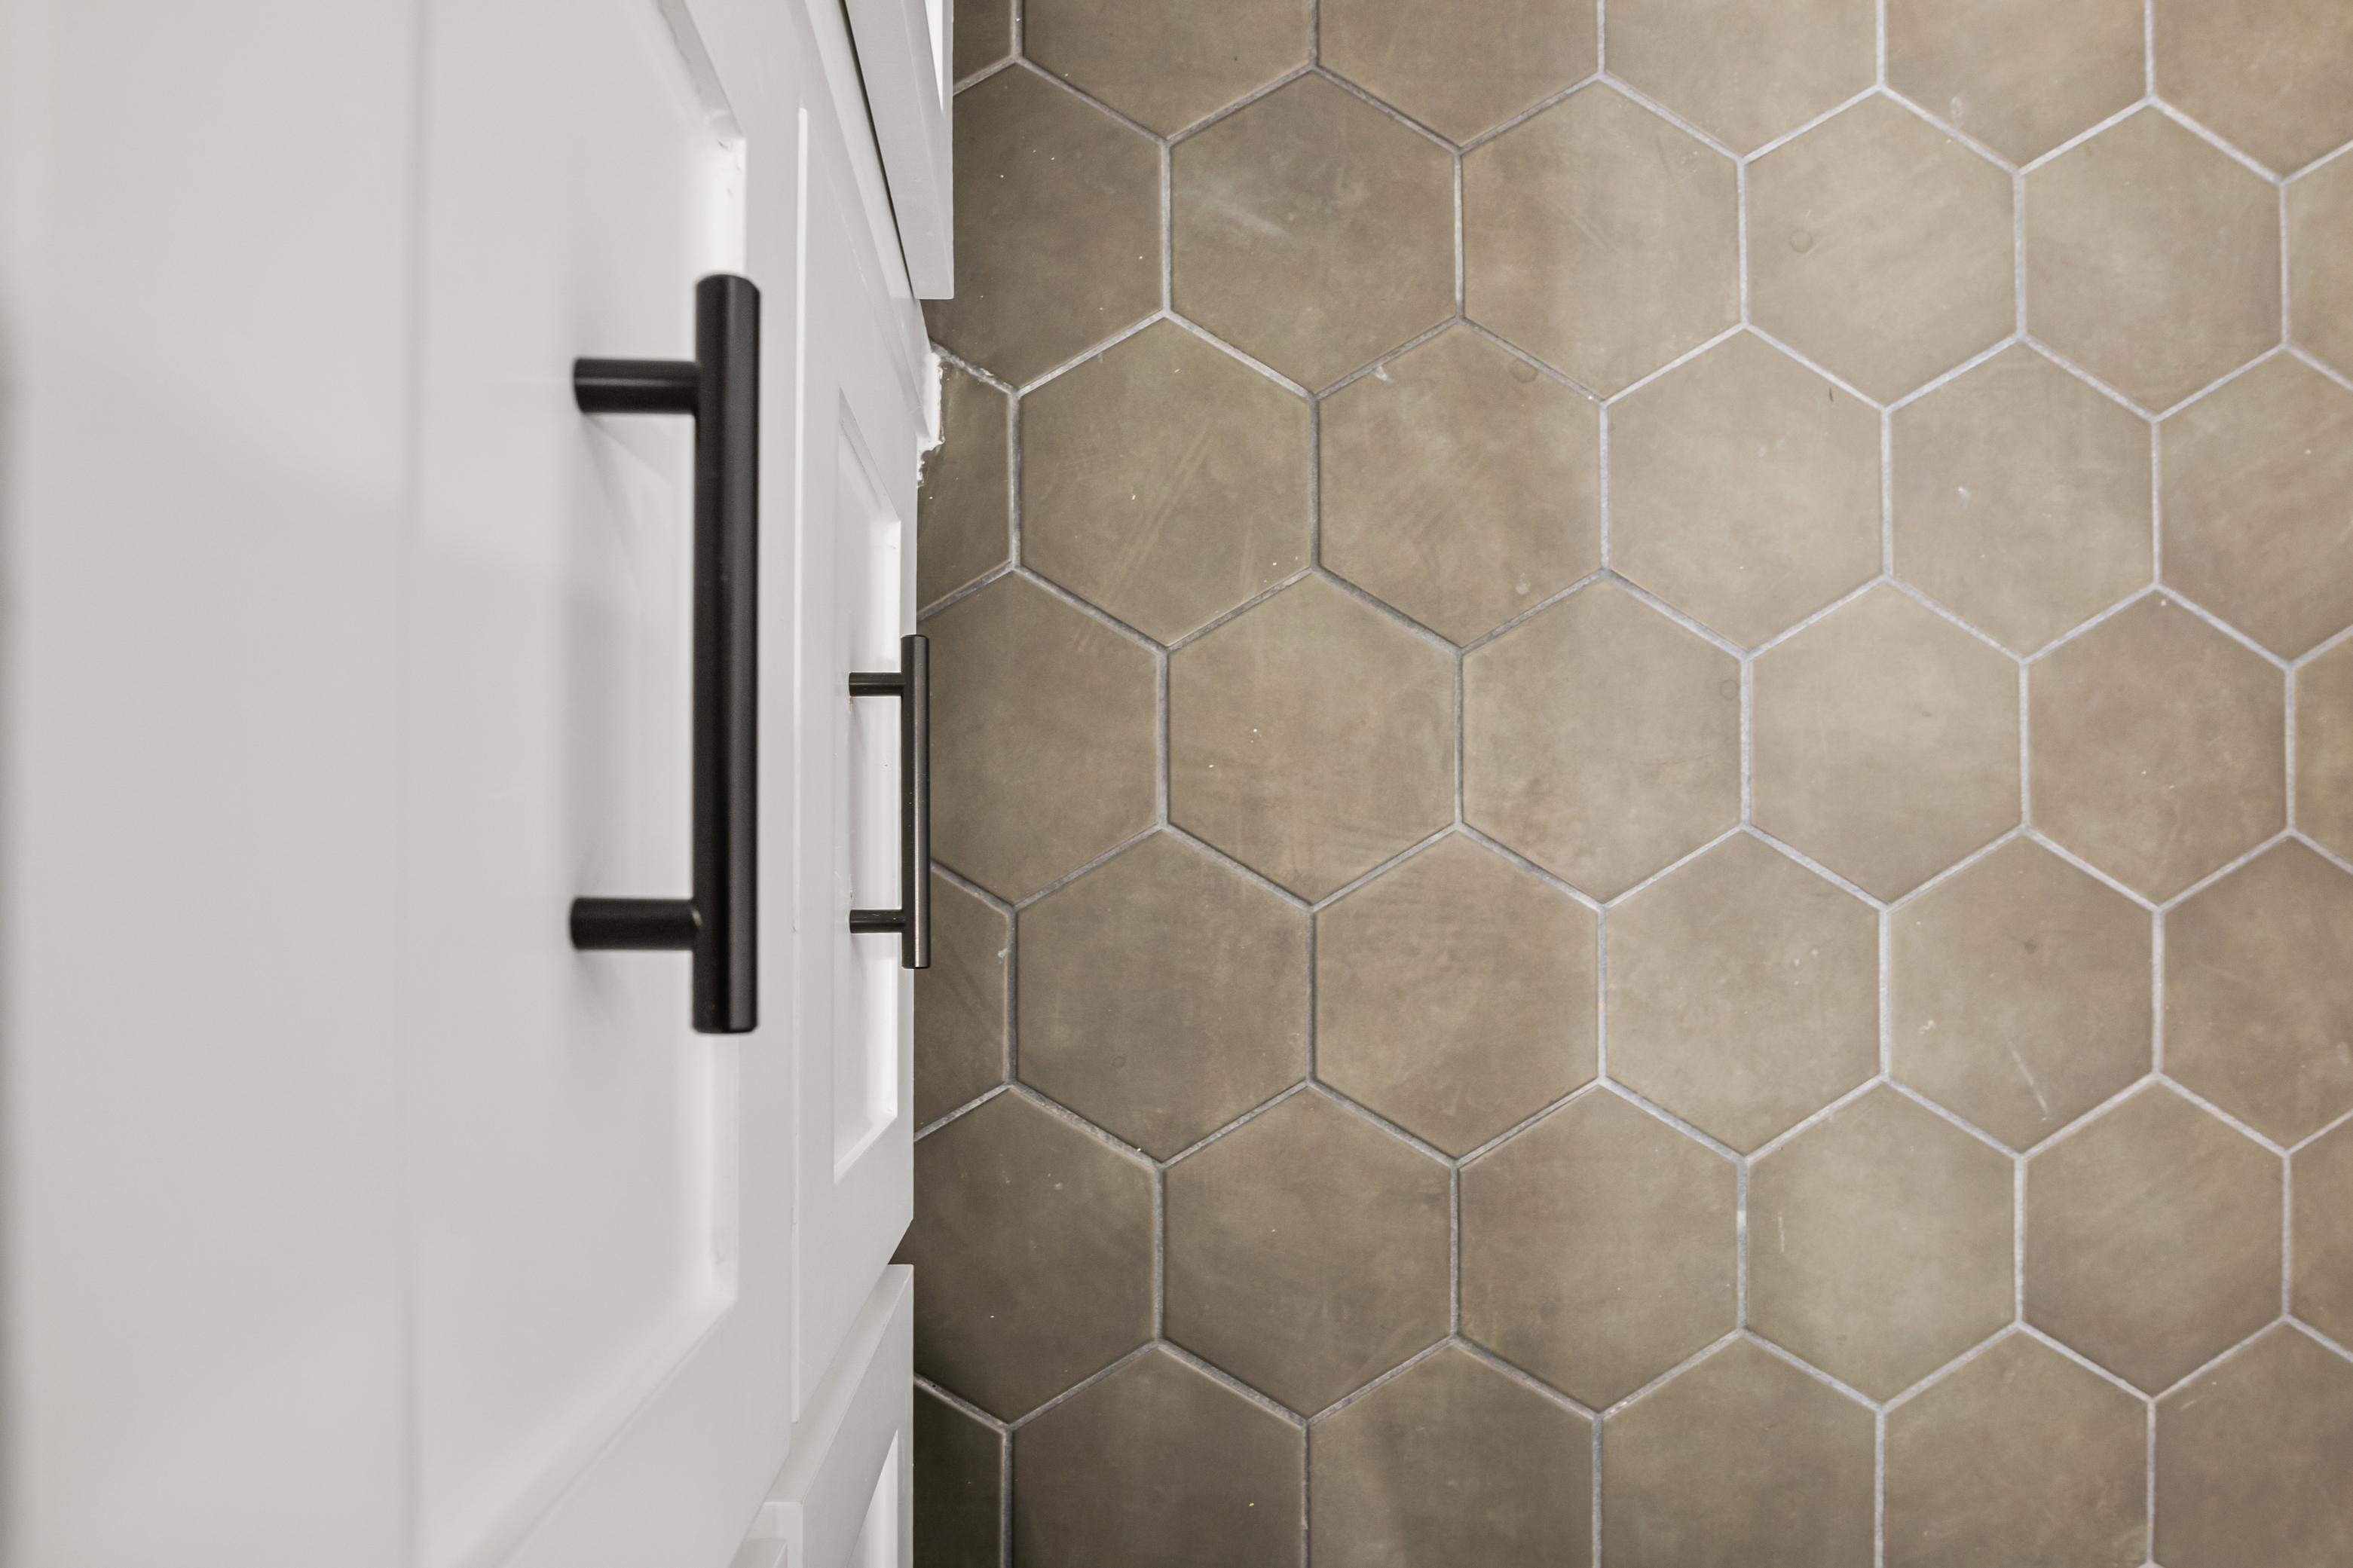 https://0201.nccdn.net/1_2/000/000/0af/8bd/bathroom-2-floor.jpg